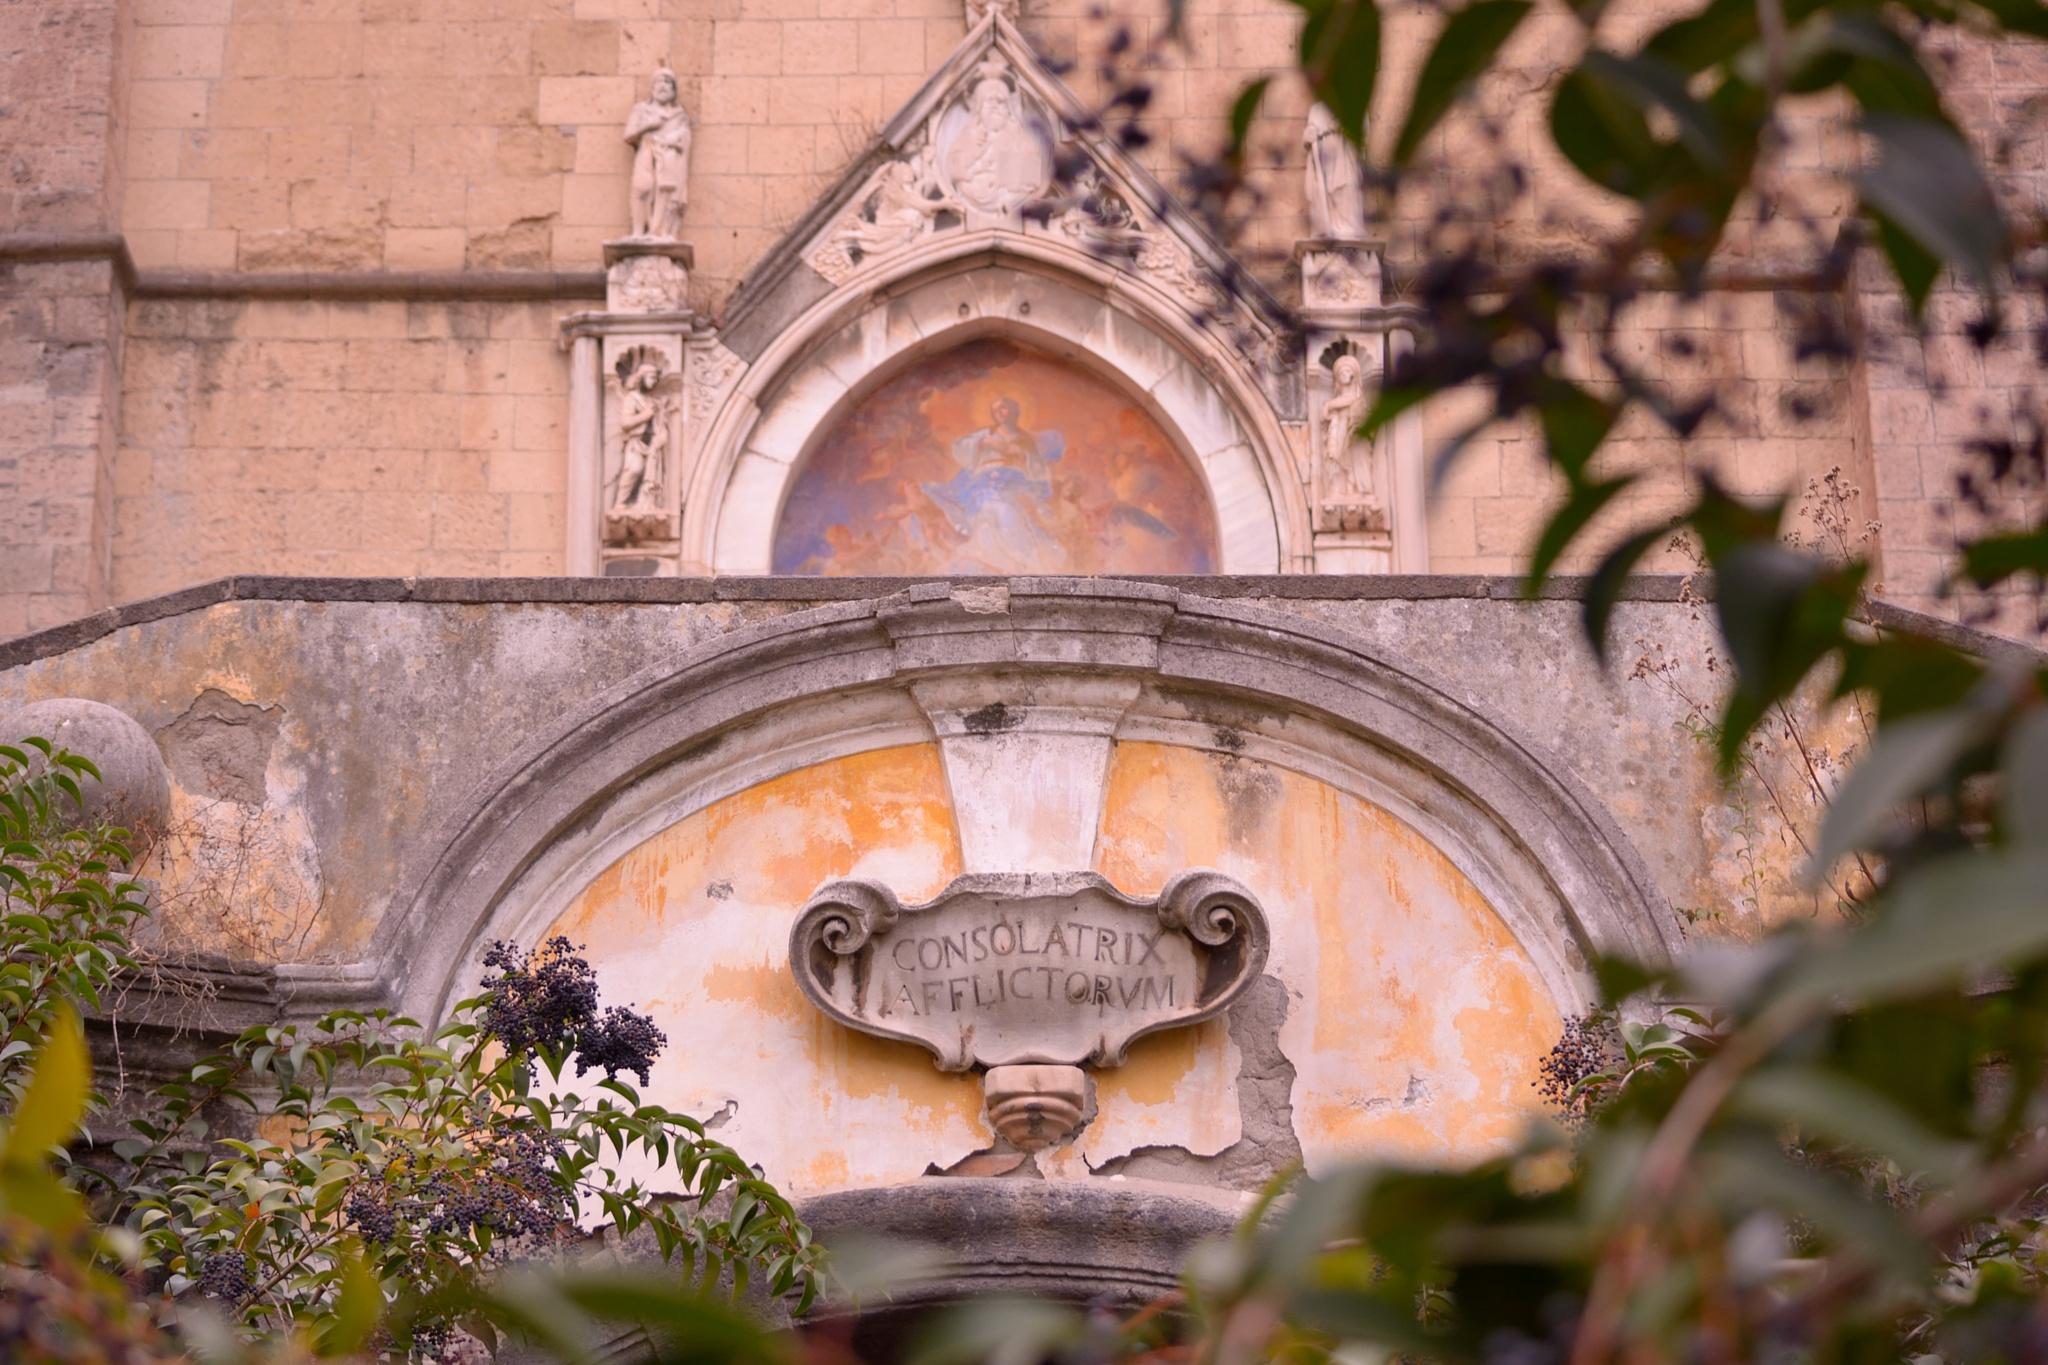 Chiesa di San Giovanni a Carbonara by InSight